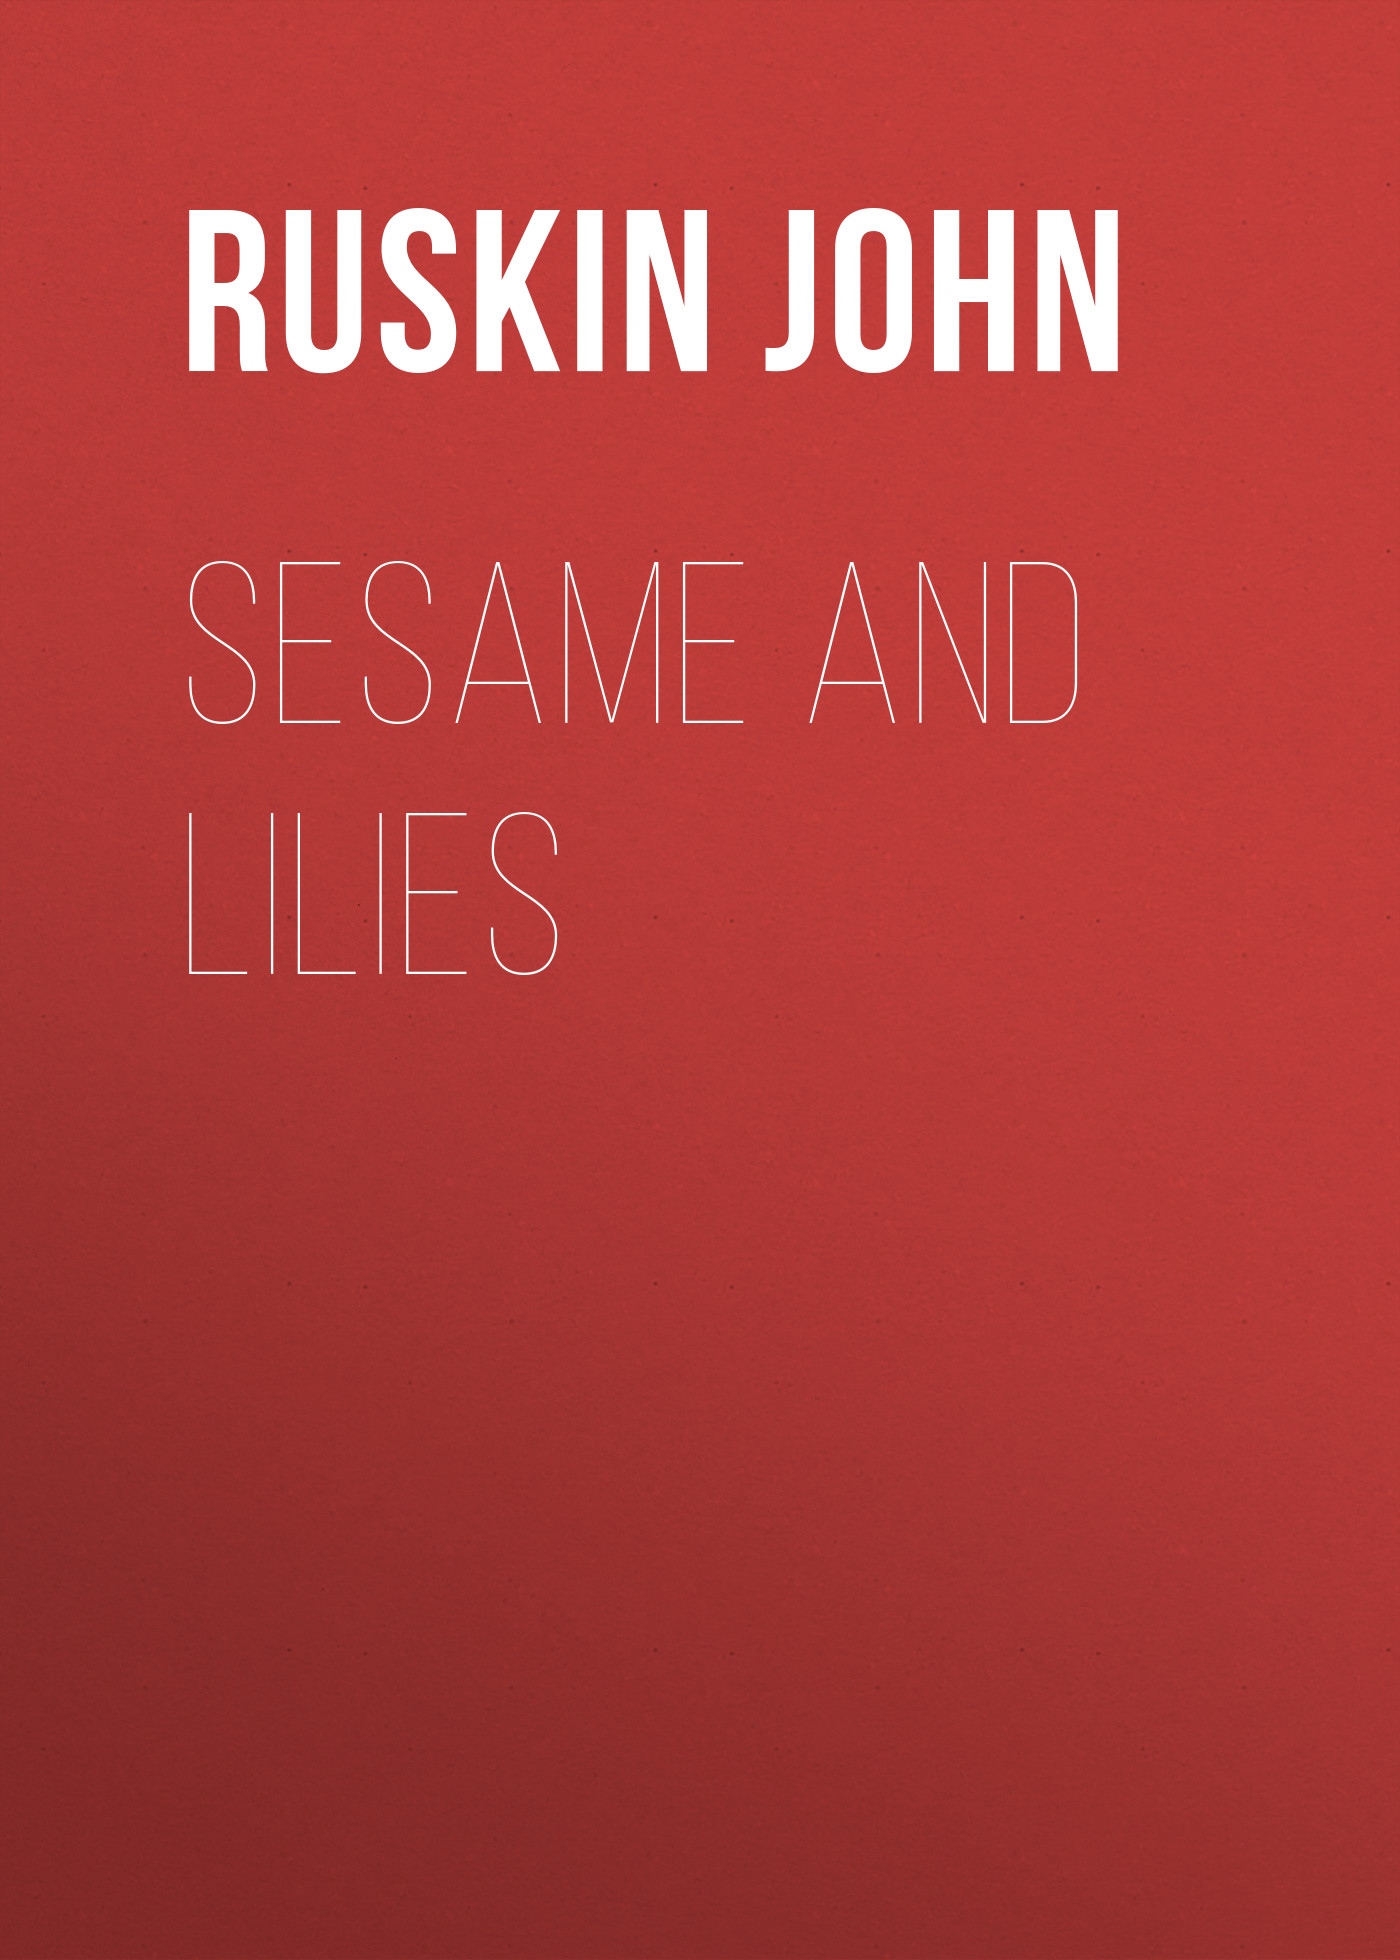 Ruskin John Sesame and Lilies john ruskin la bible d amiens